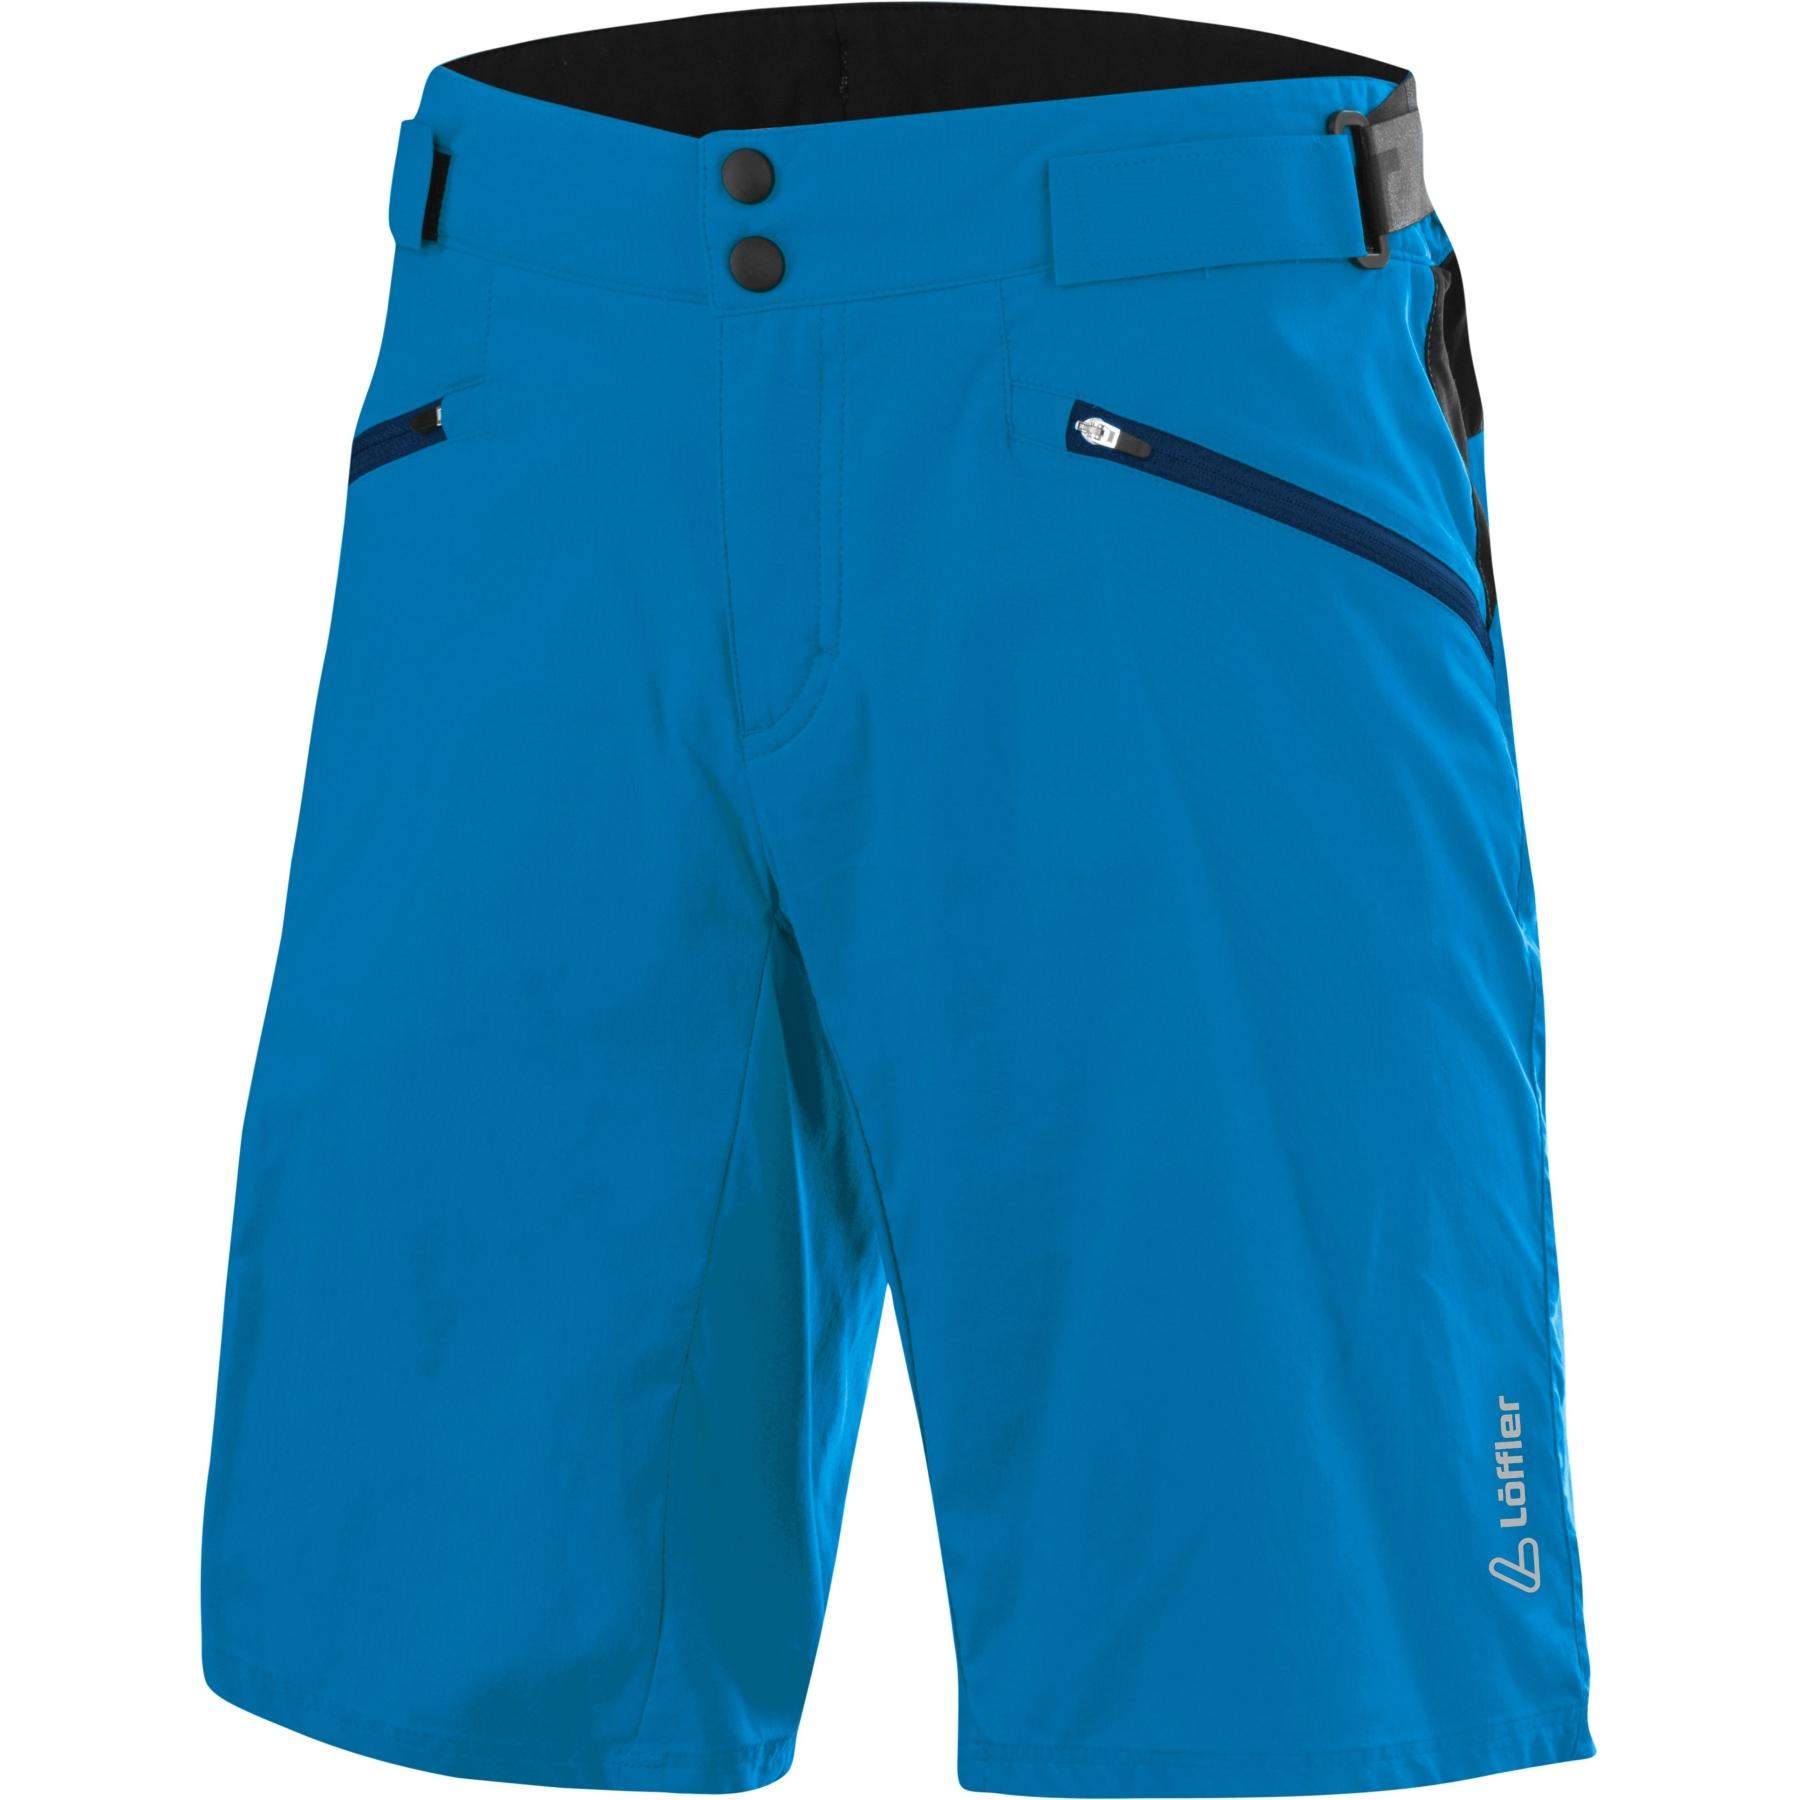 Löffler Bike Shorts Pace CSL 23505 - blue lake 426